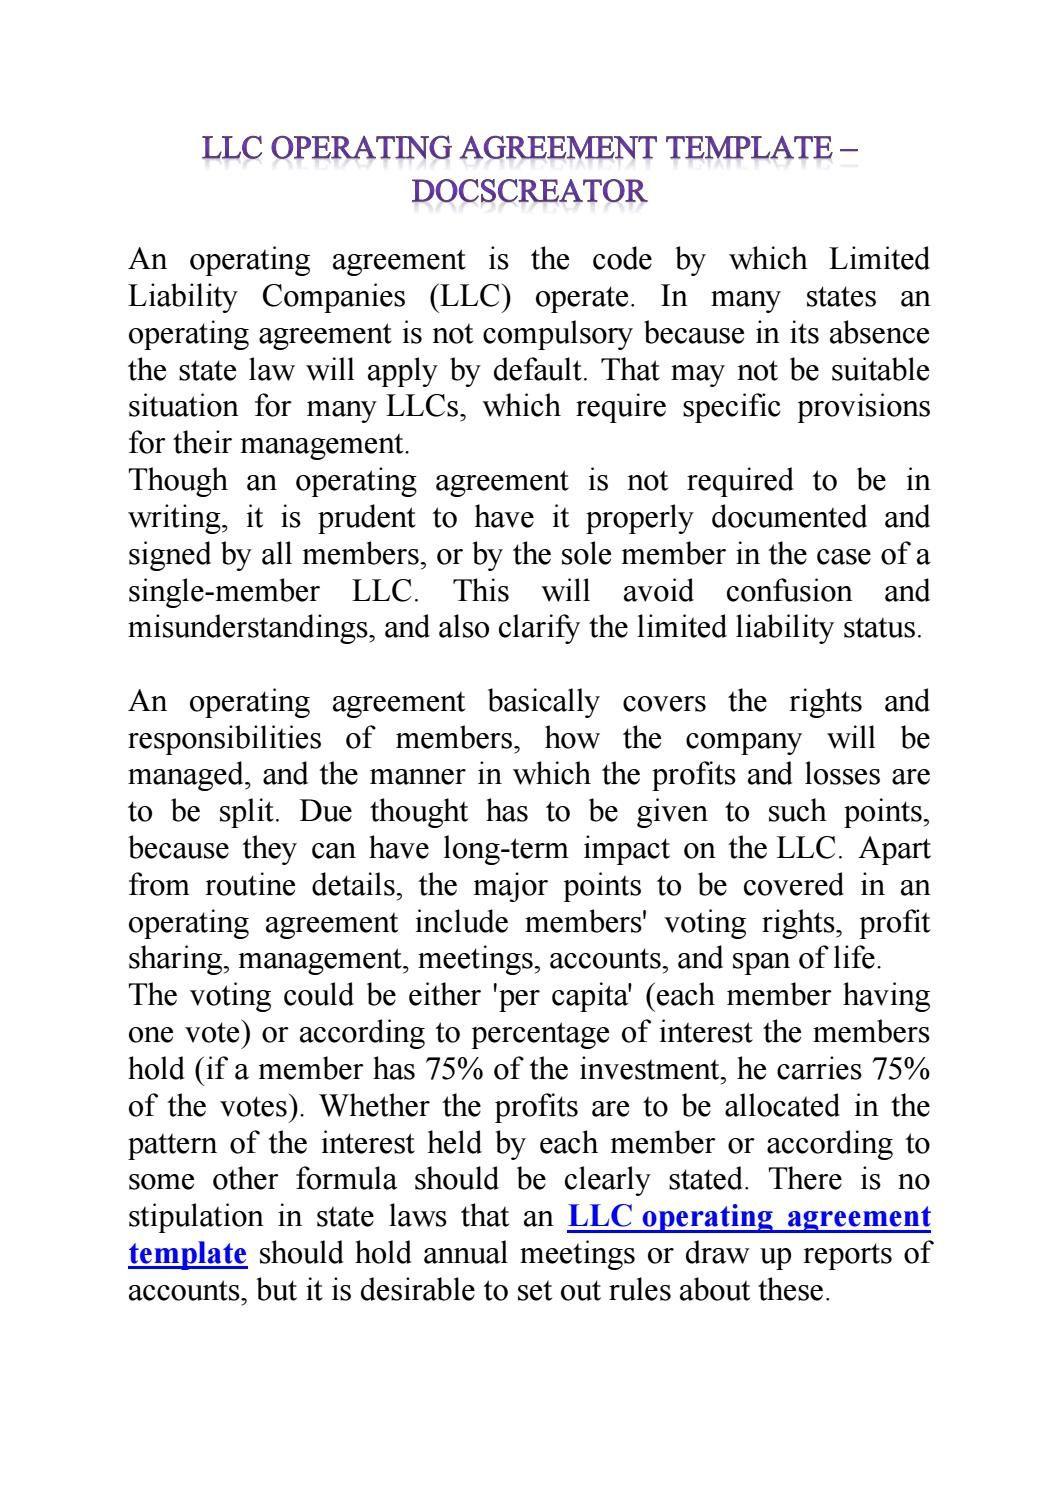 008 Simple Operation Agreement Llc Template Example  Operating Florida Indiana Single Member CaliforniaFull